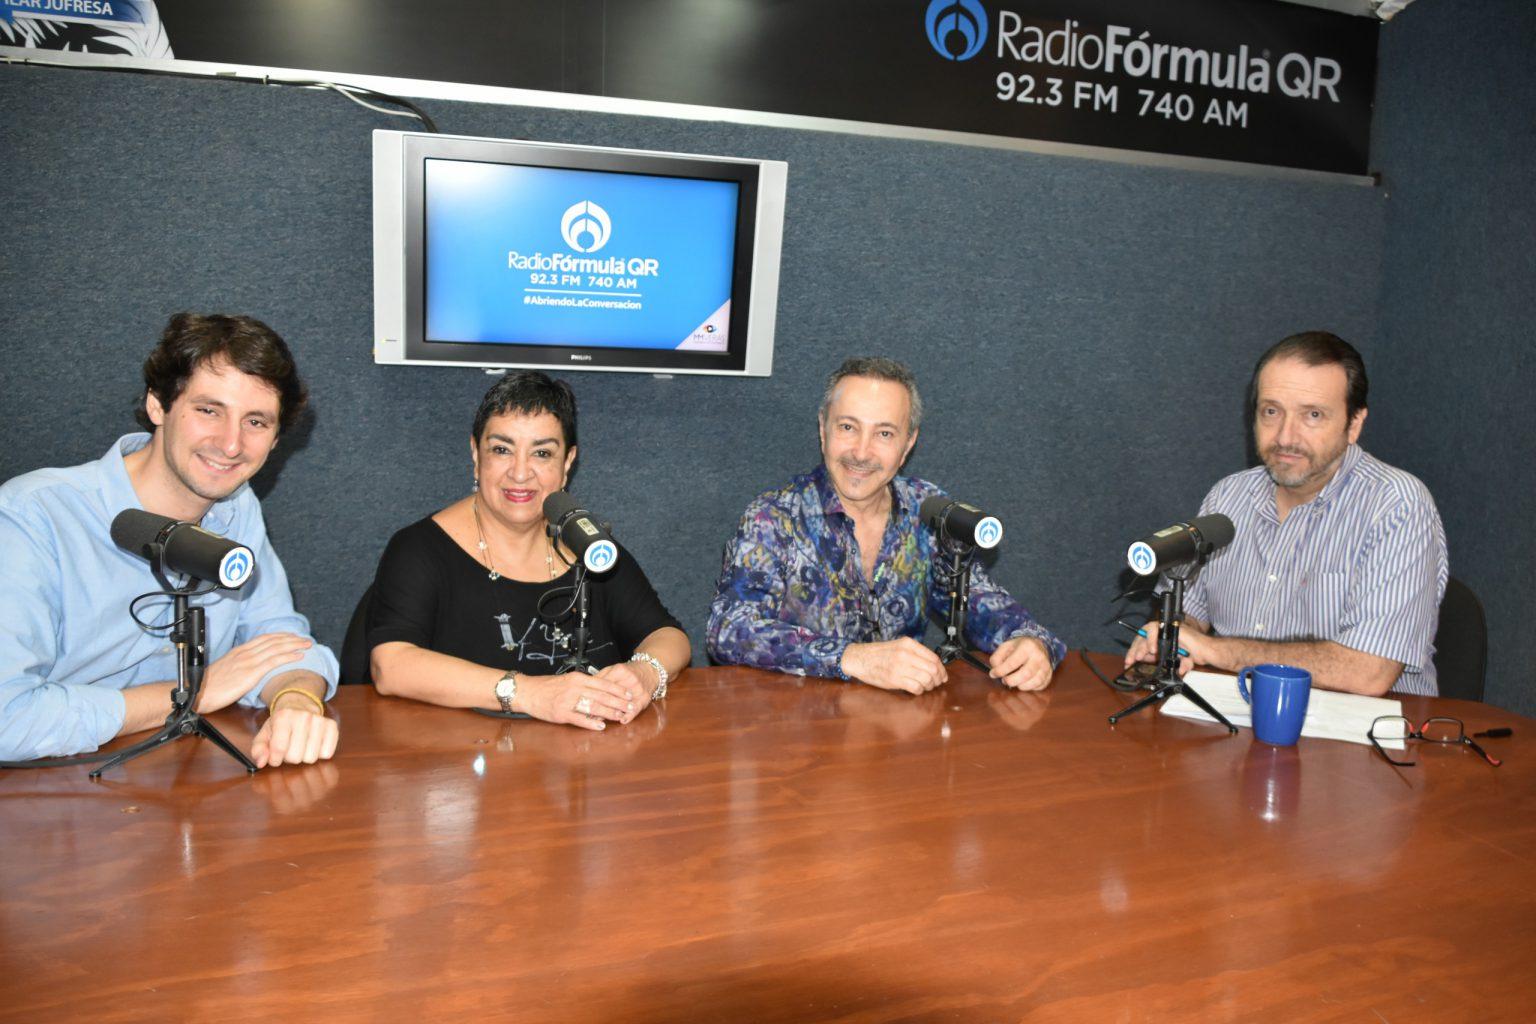 Radio Fórmula QR 5 November 2019 Radio Fórmula QR, 92.3 FM 740 AM